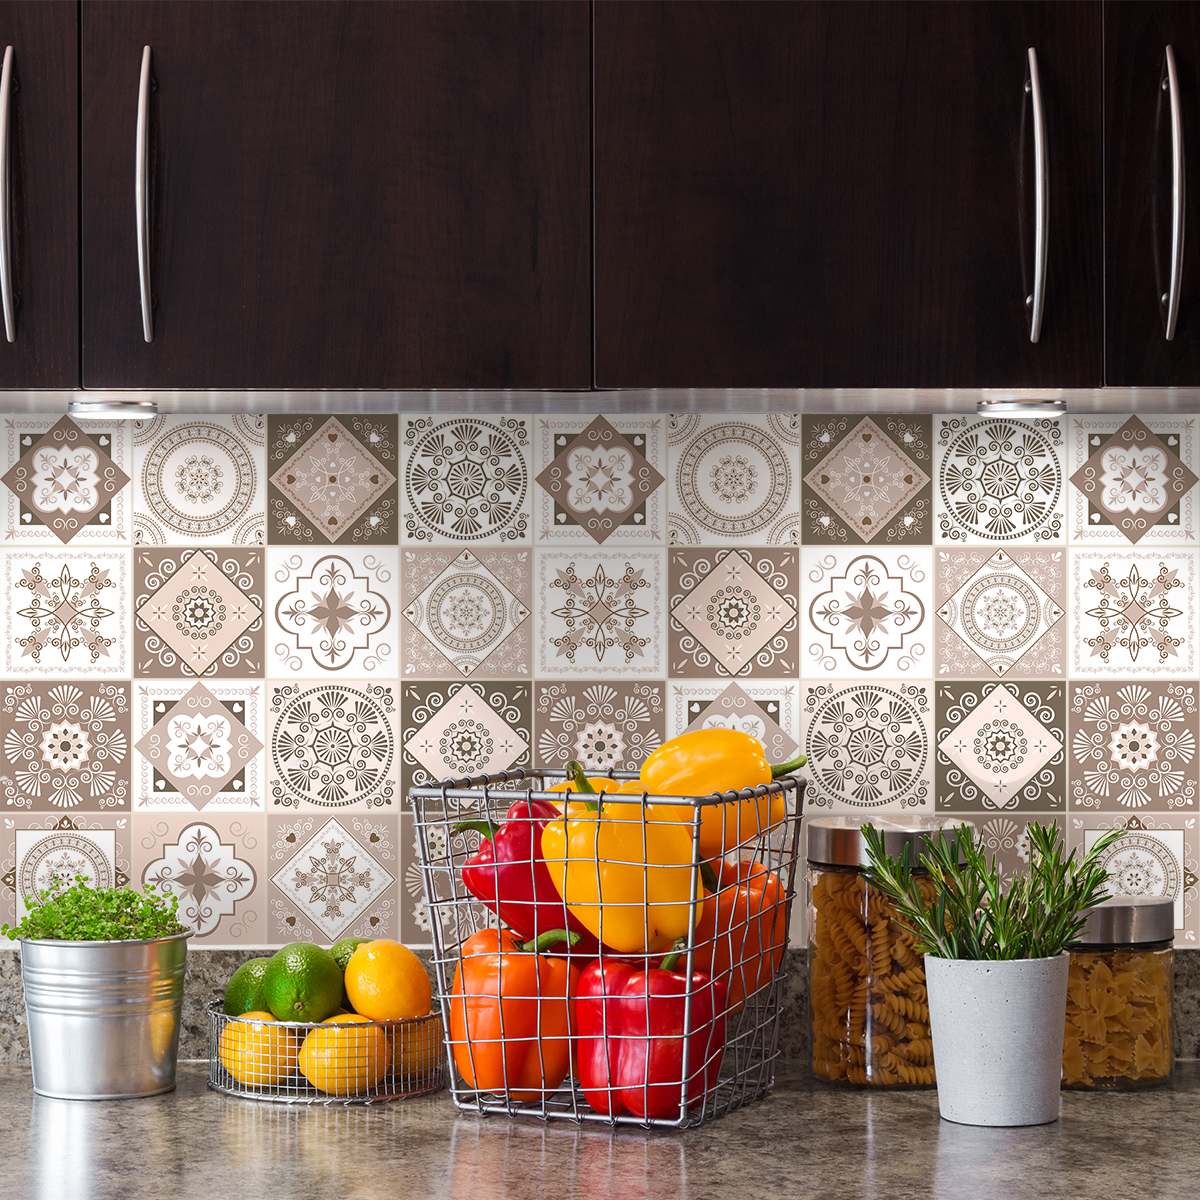 9 stickers carreaux de ciment azulejos aniolo stickers. Black Bedroom Furniture Sets. Home Design Ideas